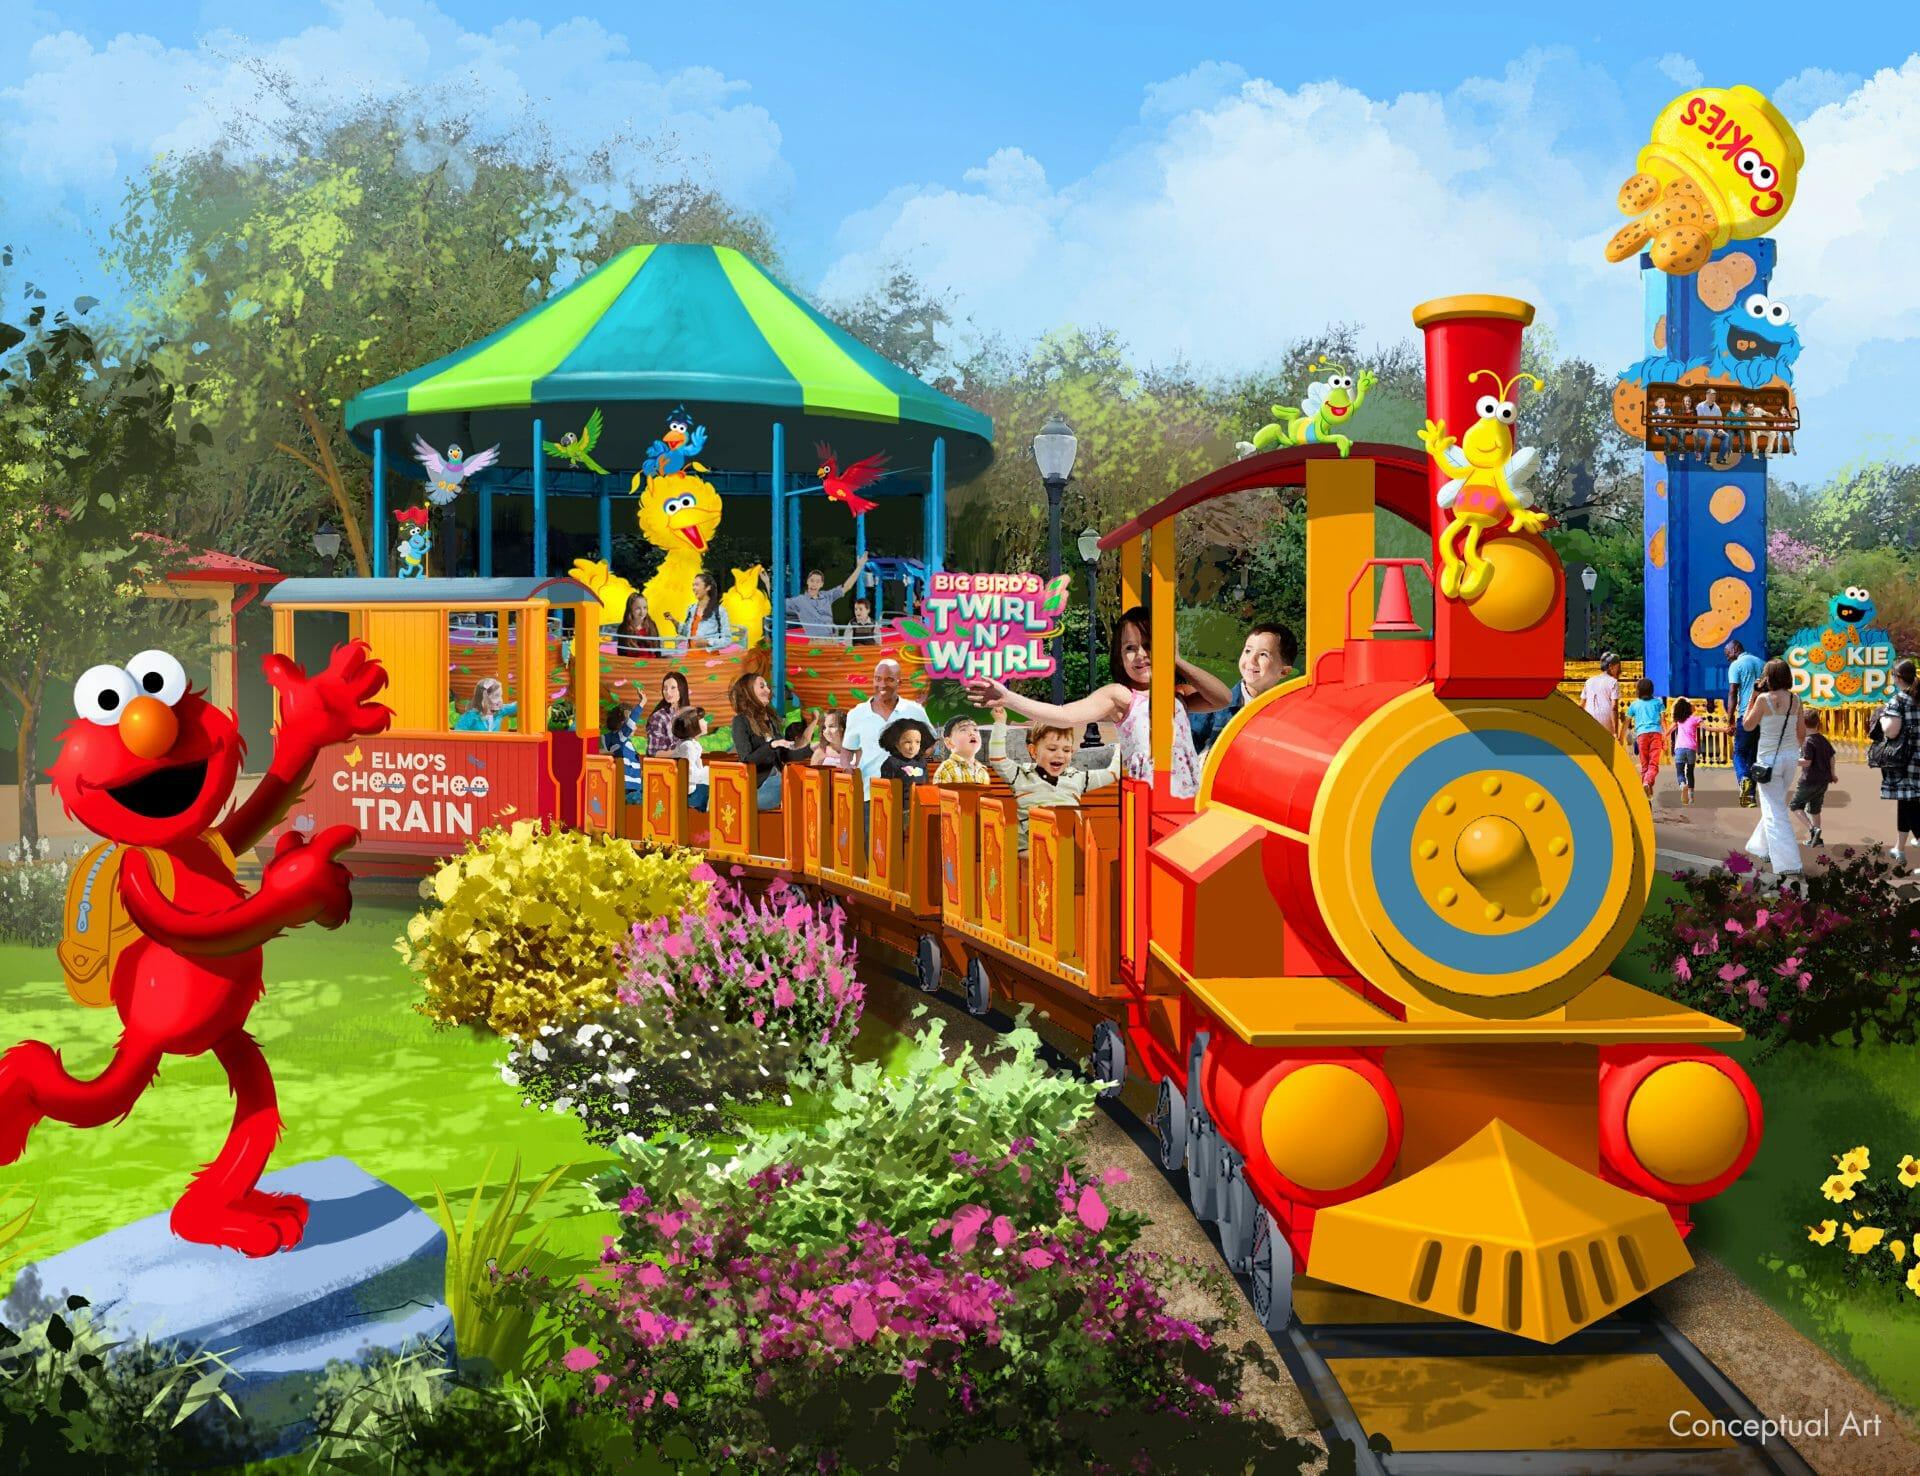 Sesame Street is Turning 50 at SeaWorld Orlando